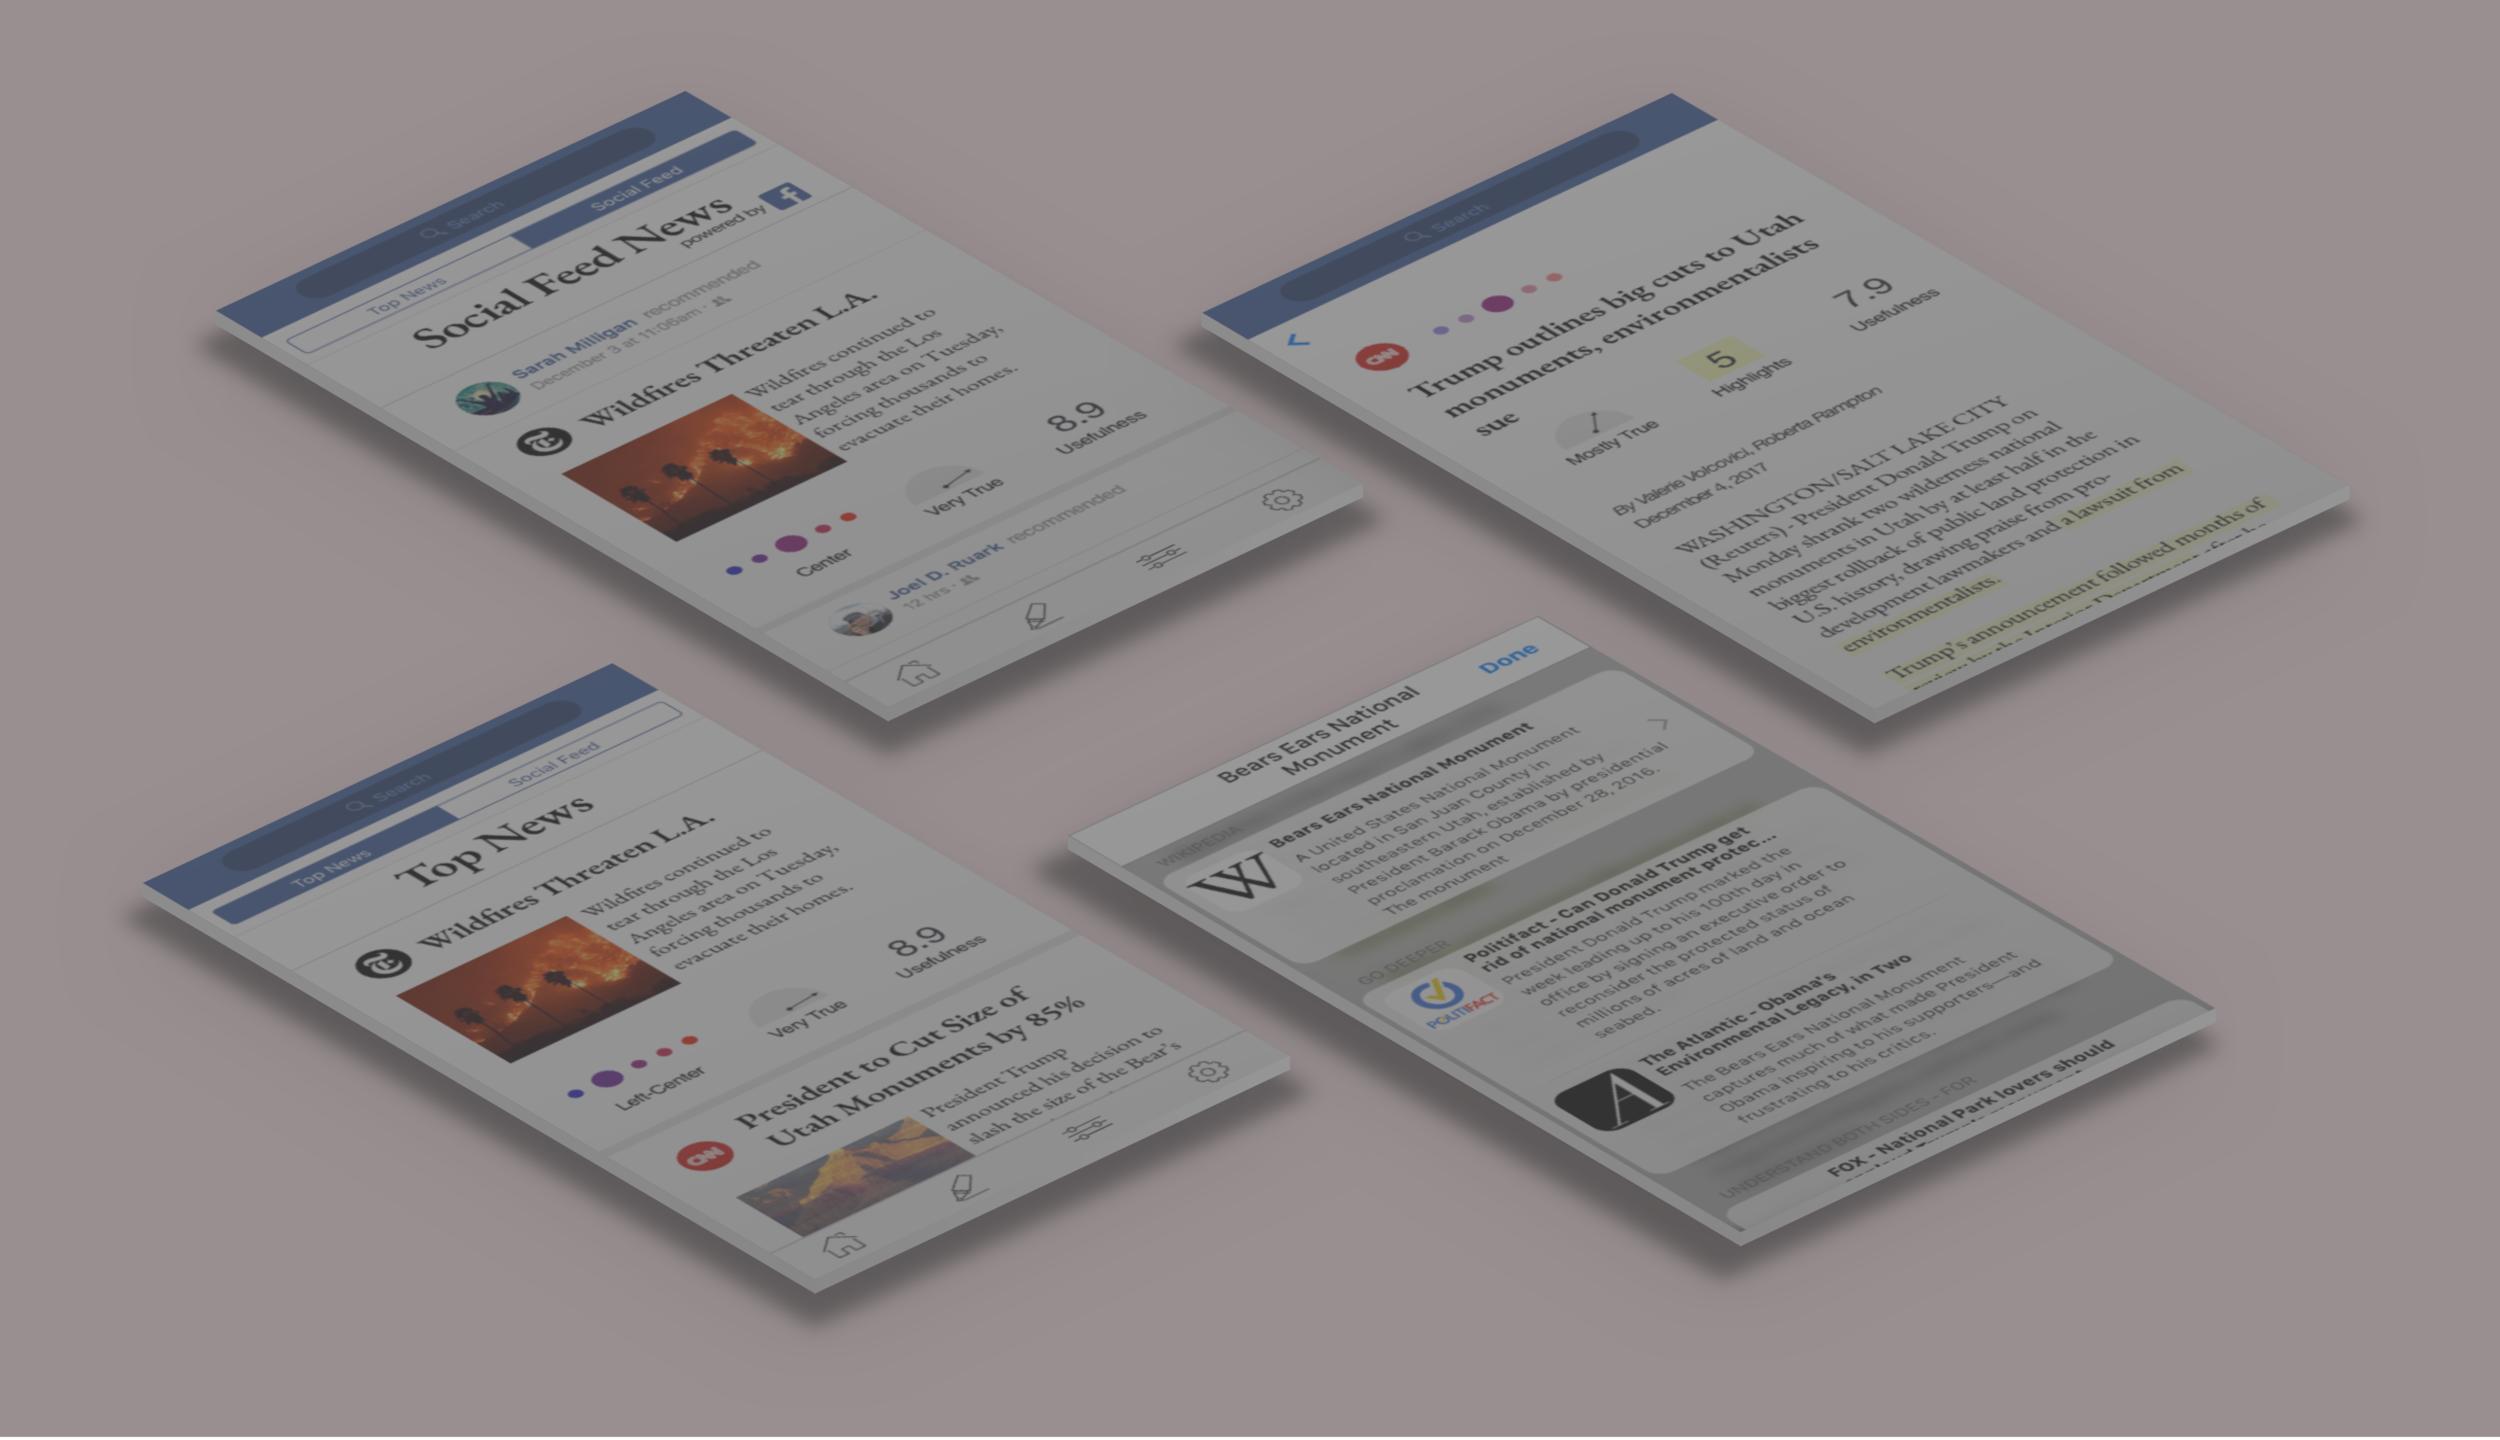 Impact-Driven News App Design - PASSION PROJECT (CONCEPTUAL)